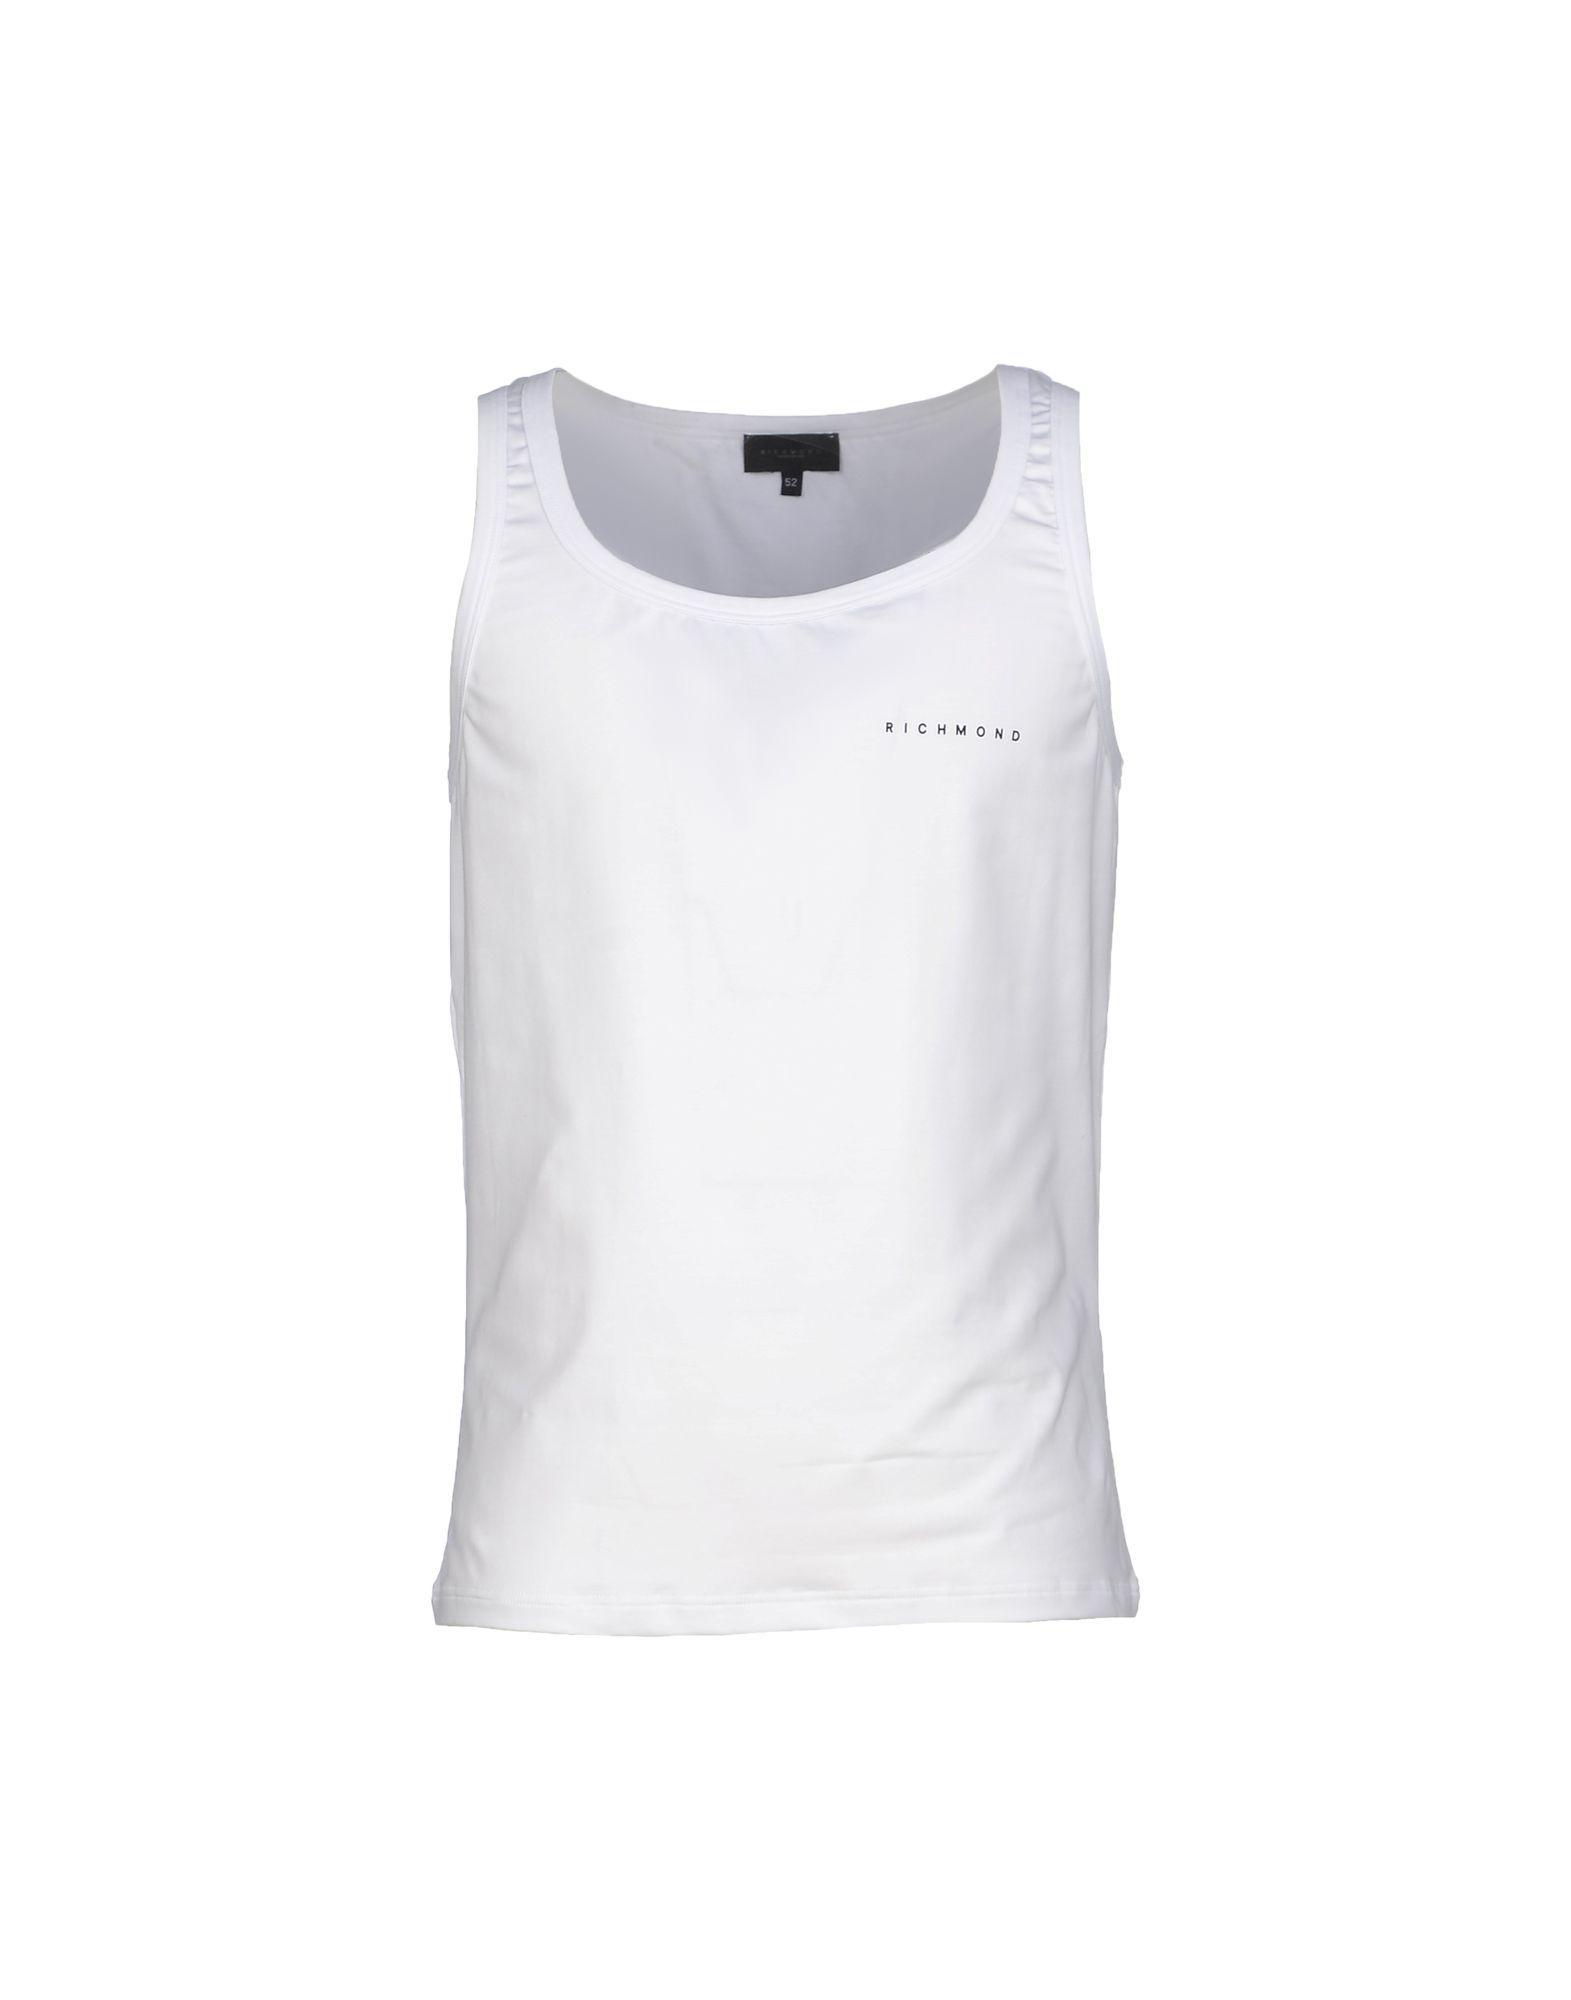 John Richmond Underwear White Cotton Tank